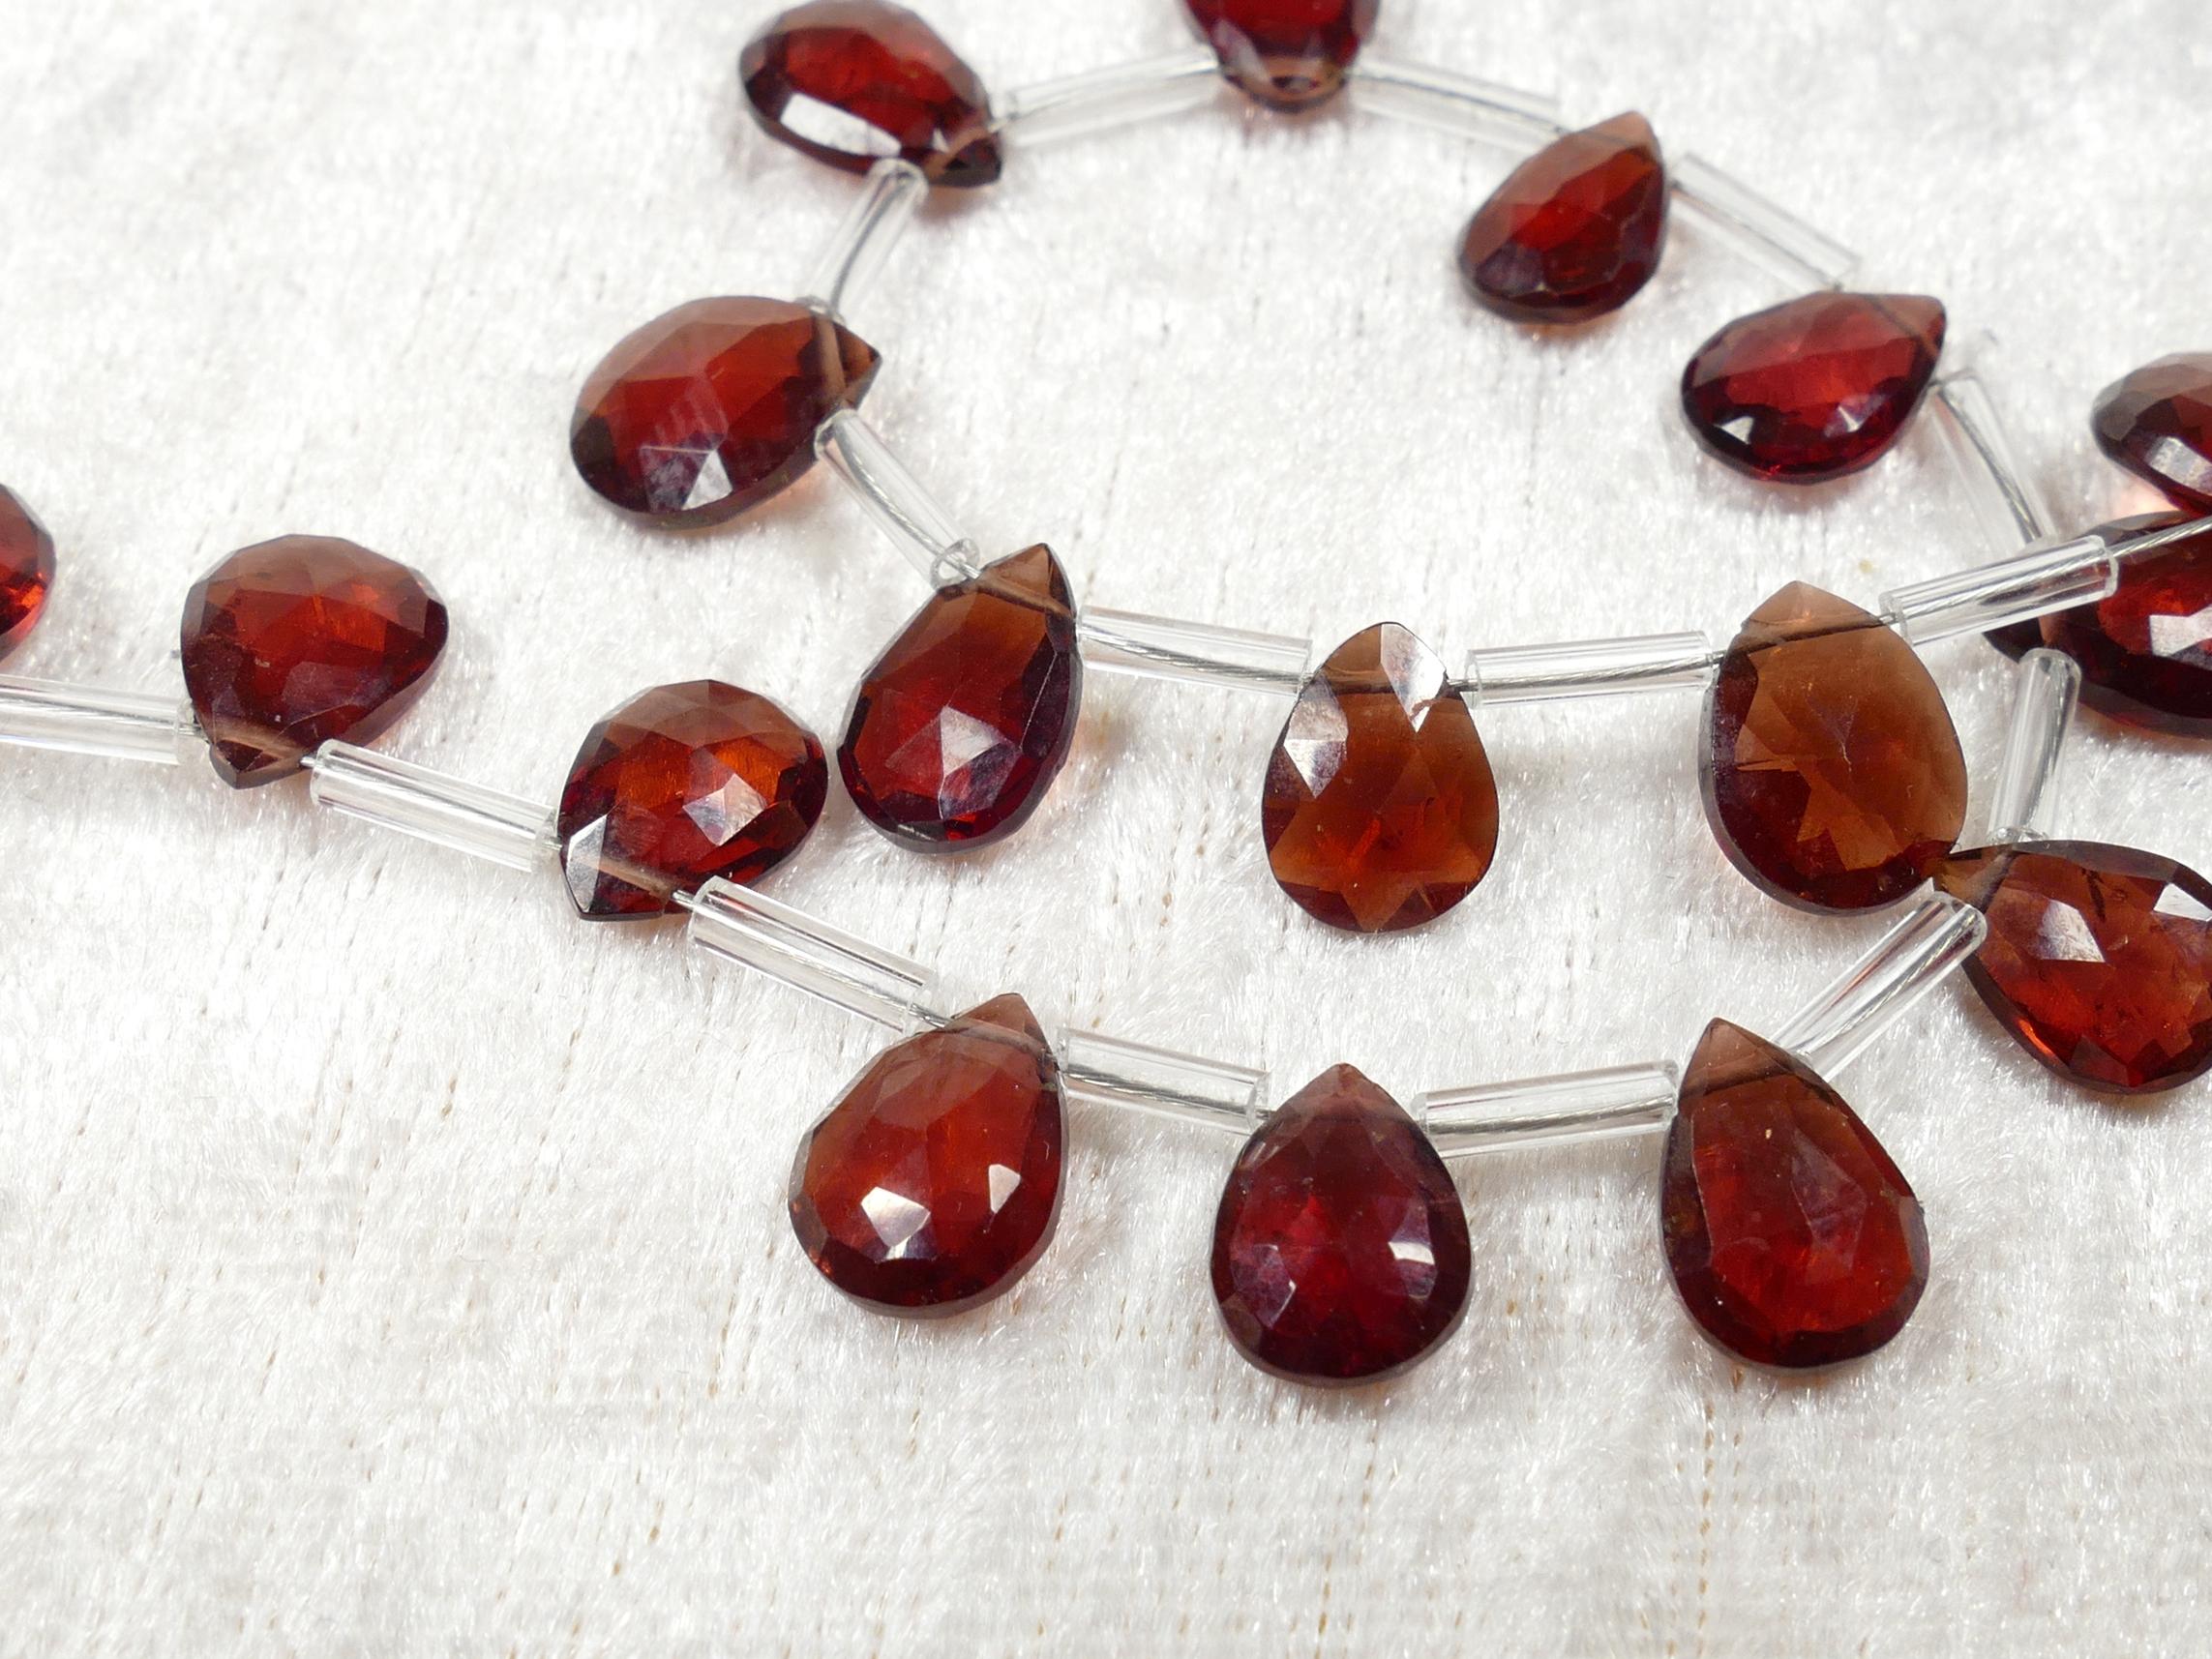 A/AAA 9x7/10x8mm x4 Perles de Grenat rouge naturel en goutte plate facettée (#AC1072)